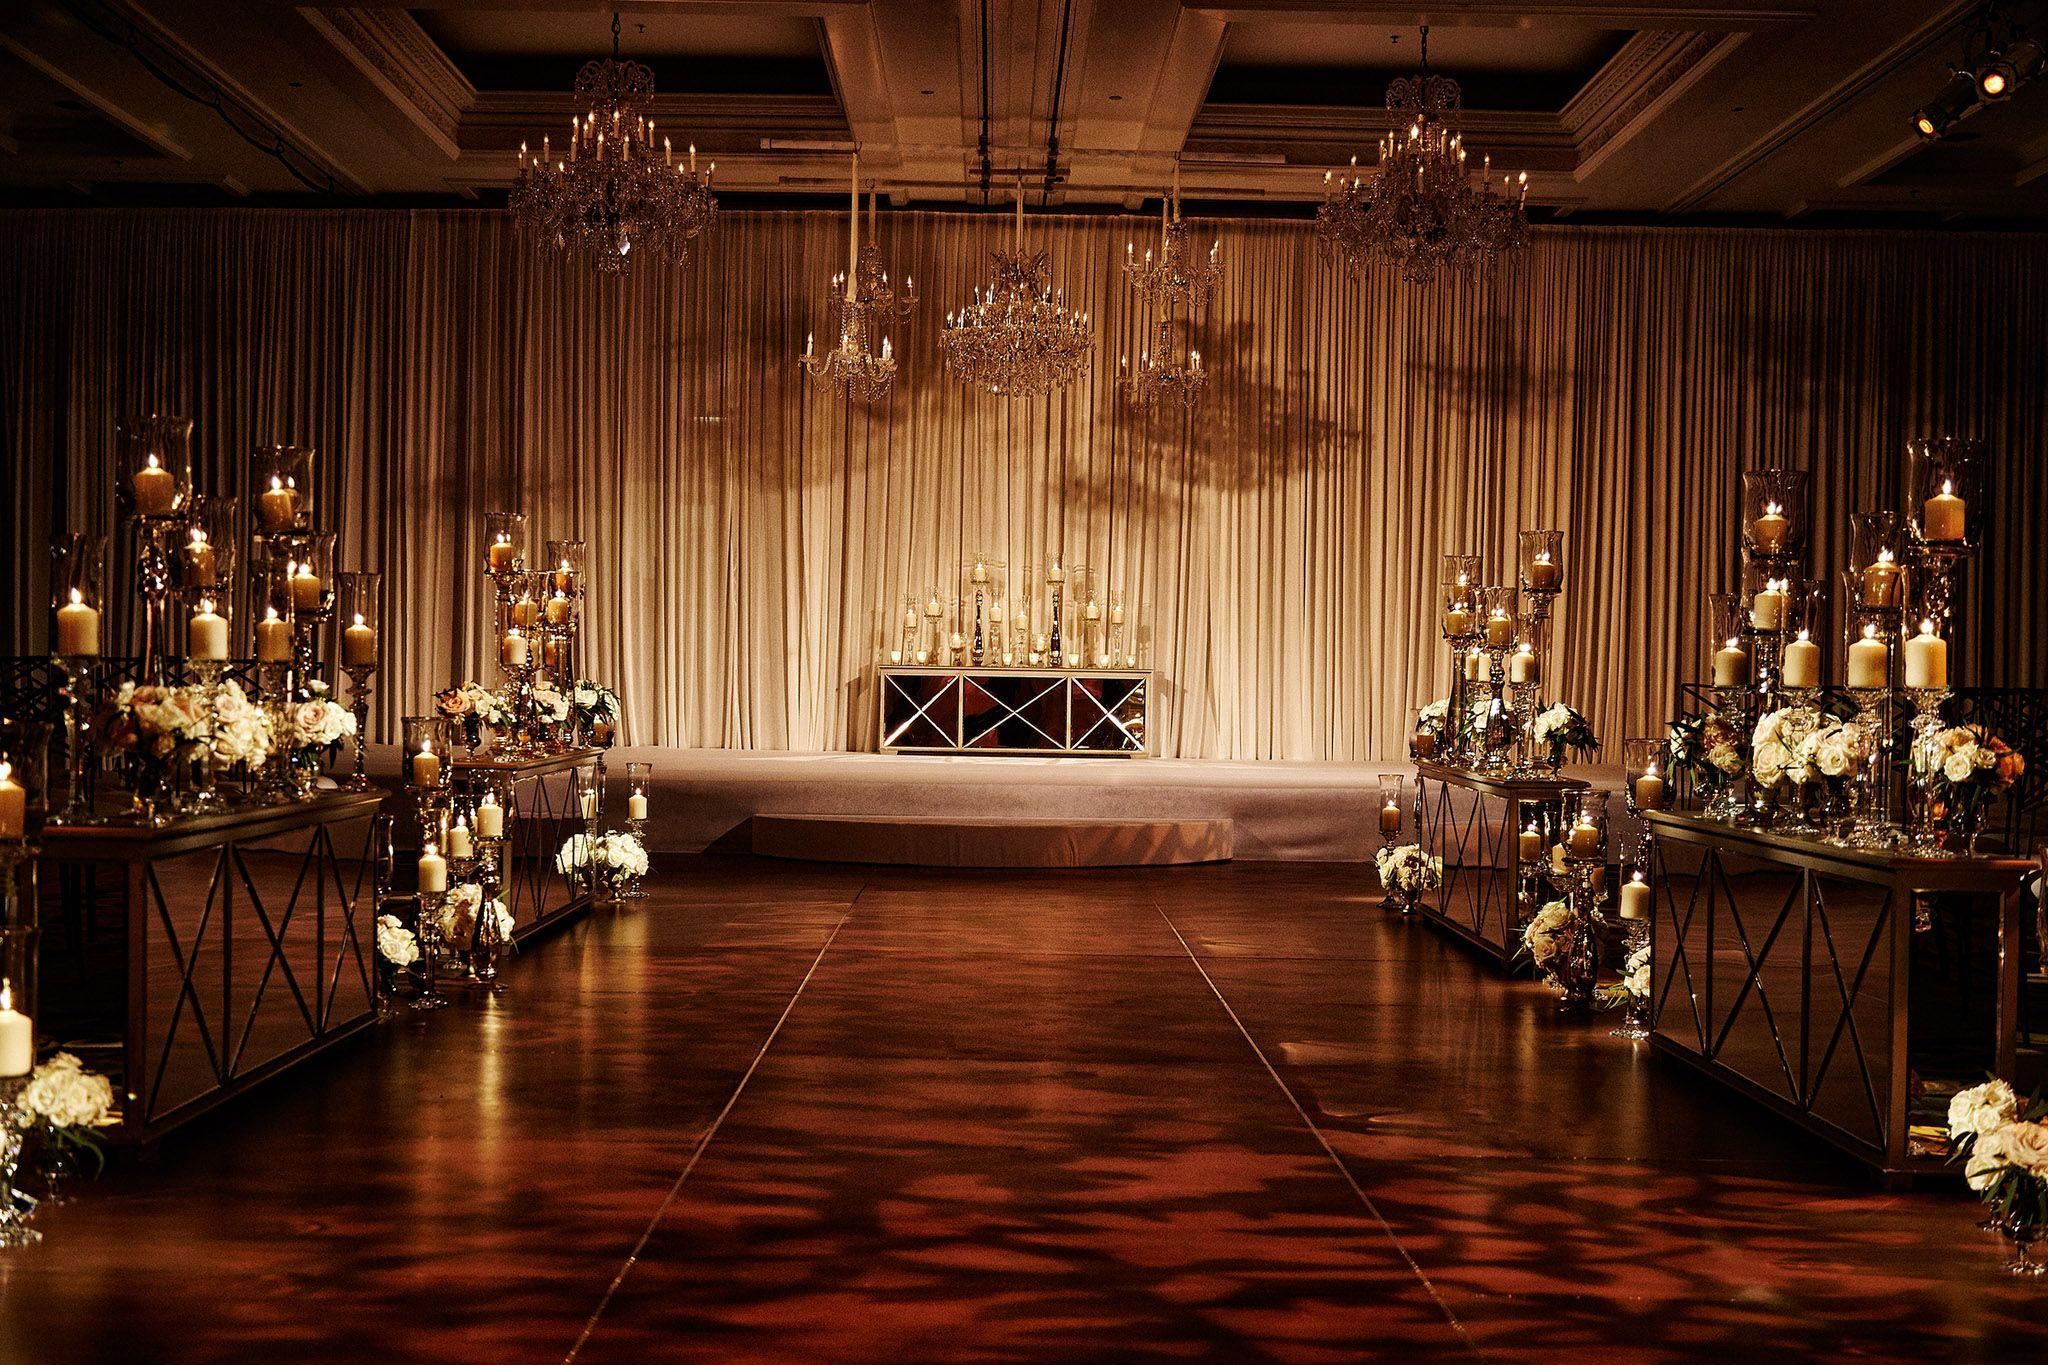 An Opulent Spring Wedding With Timeless Elegant Decor In Chicago Inside Weddings Wedding Rentals Decor Elegant Decor Wedding Drapery